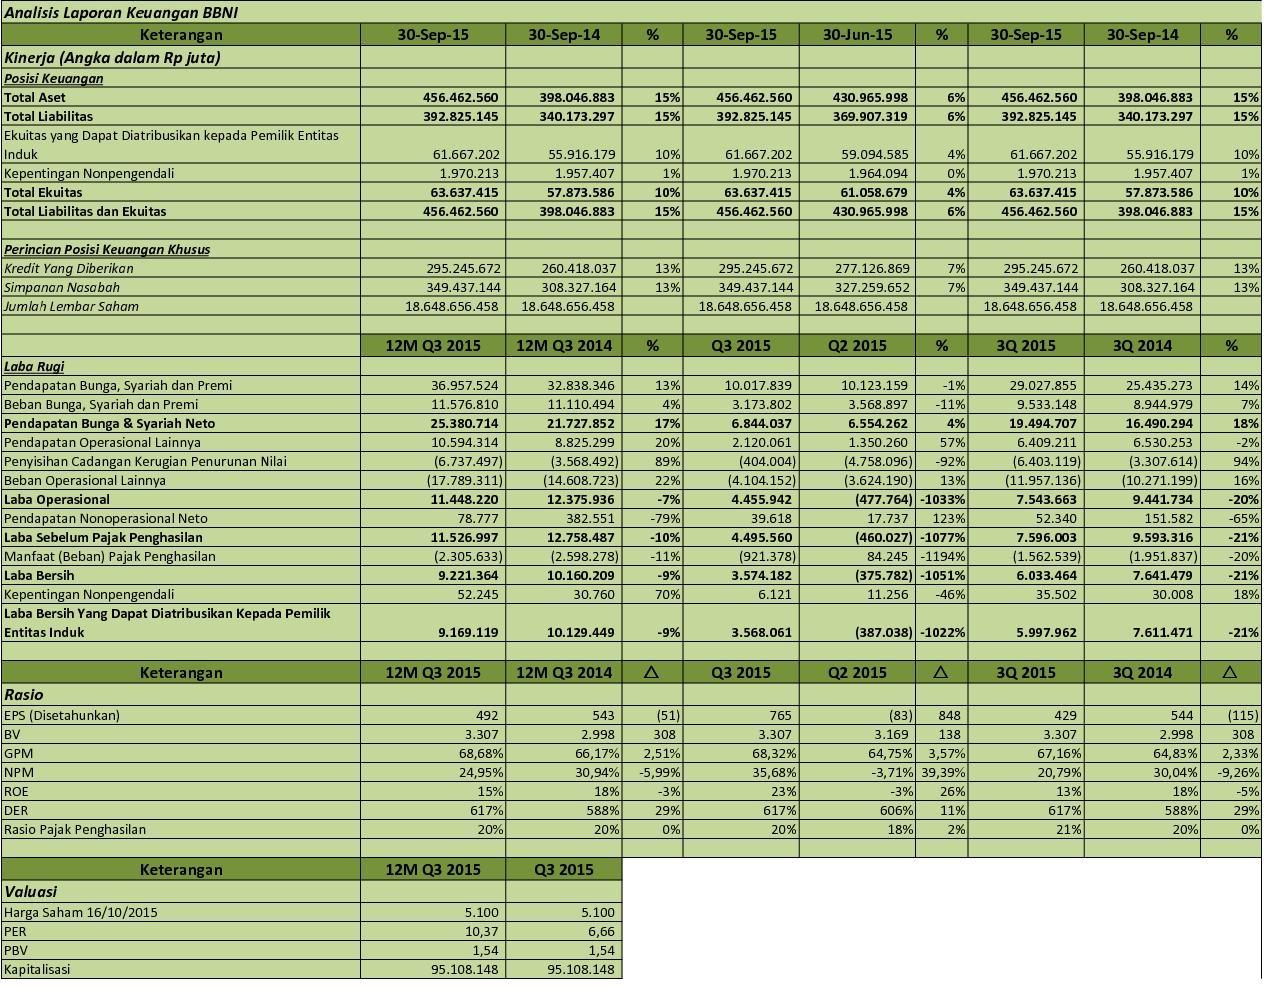 Idx Investor Bbni Analisis Laporan Keuangan Q3 2015